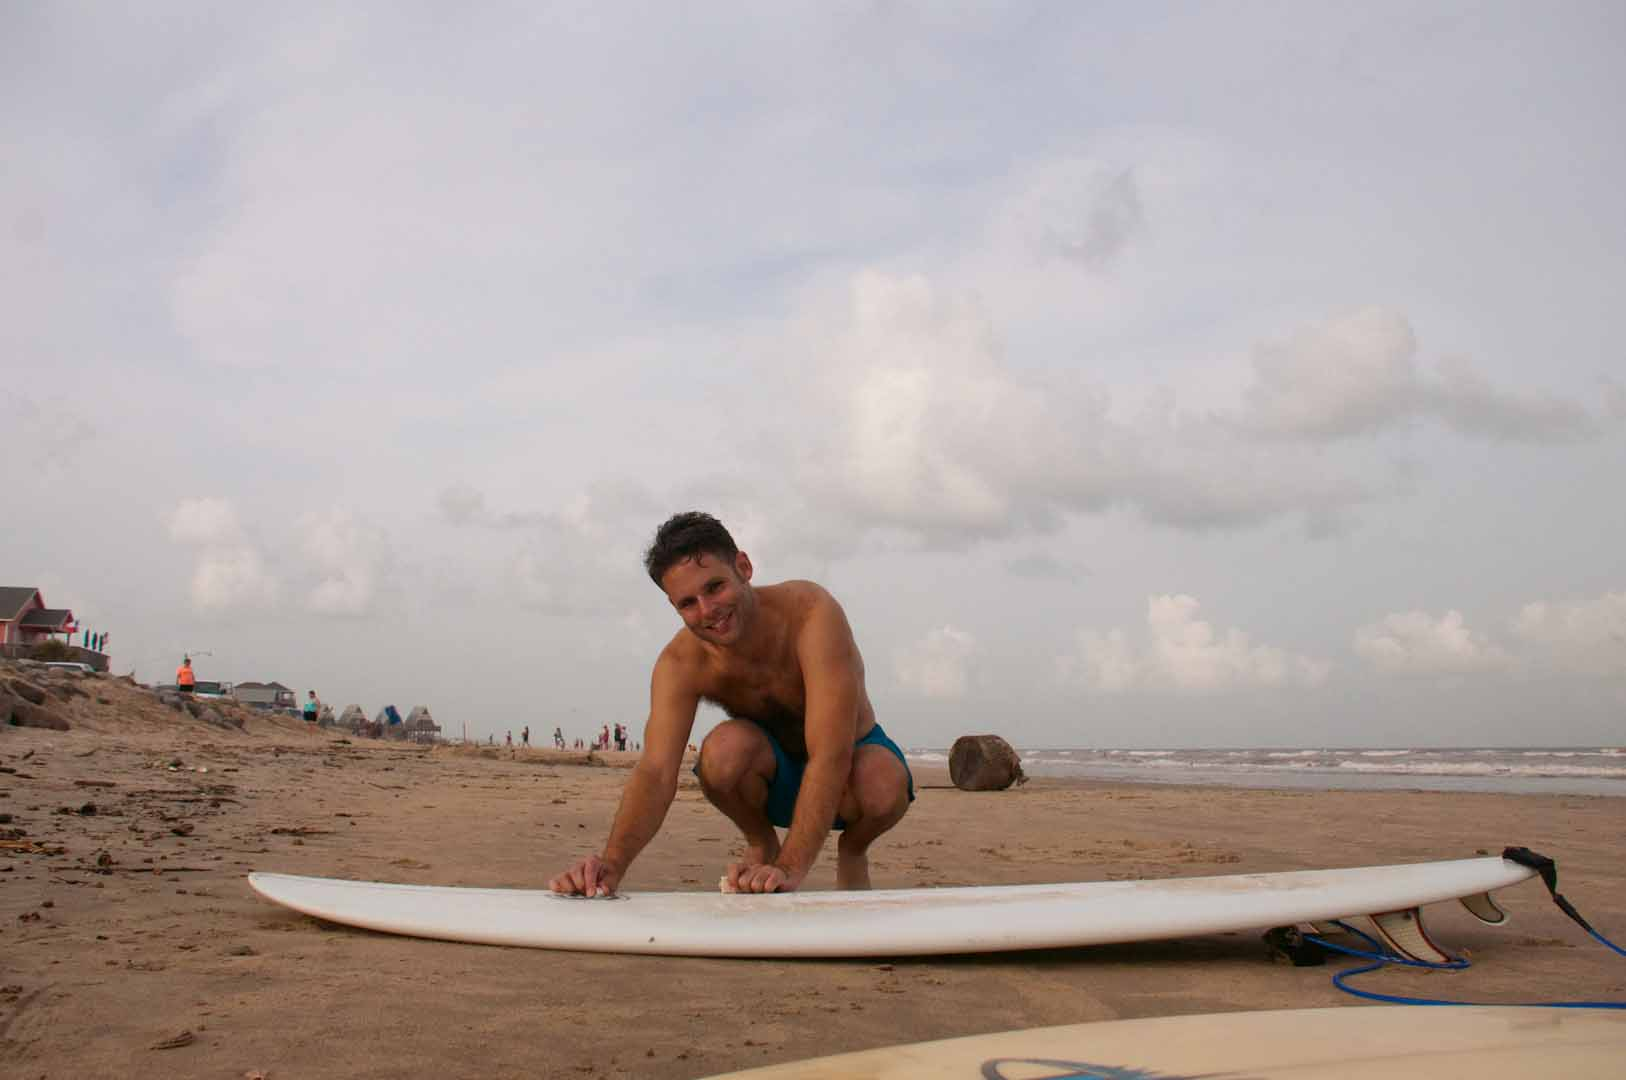 SurfsideJuly2_20150702_229